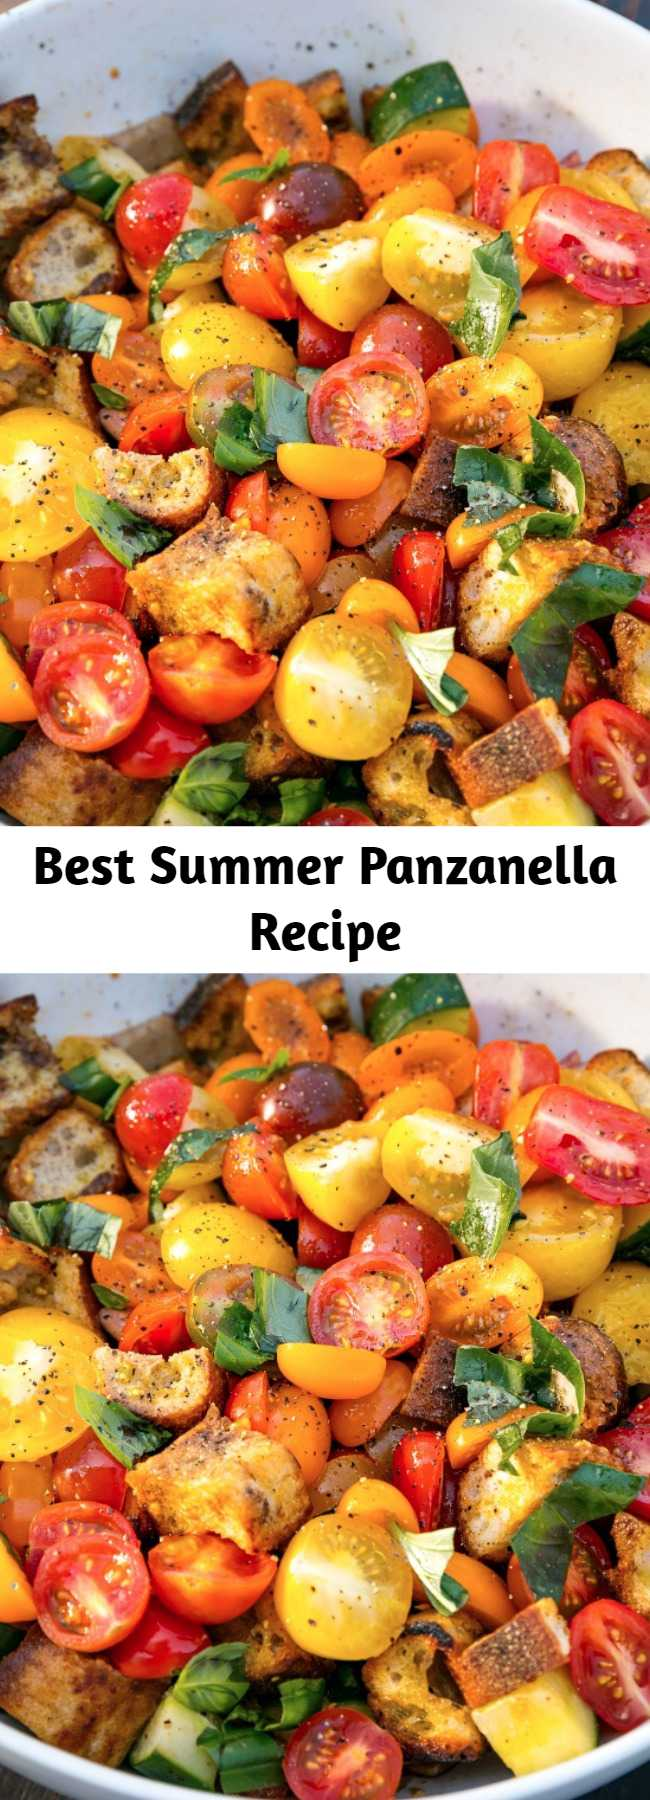 Best Summer Panzanella Recipe -  For your next BBQ, make this easy Summer Panzanella! Panzan-HELL-YEA!